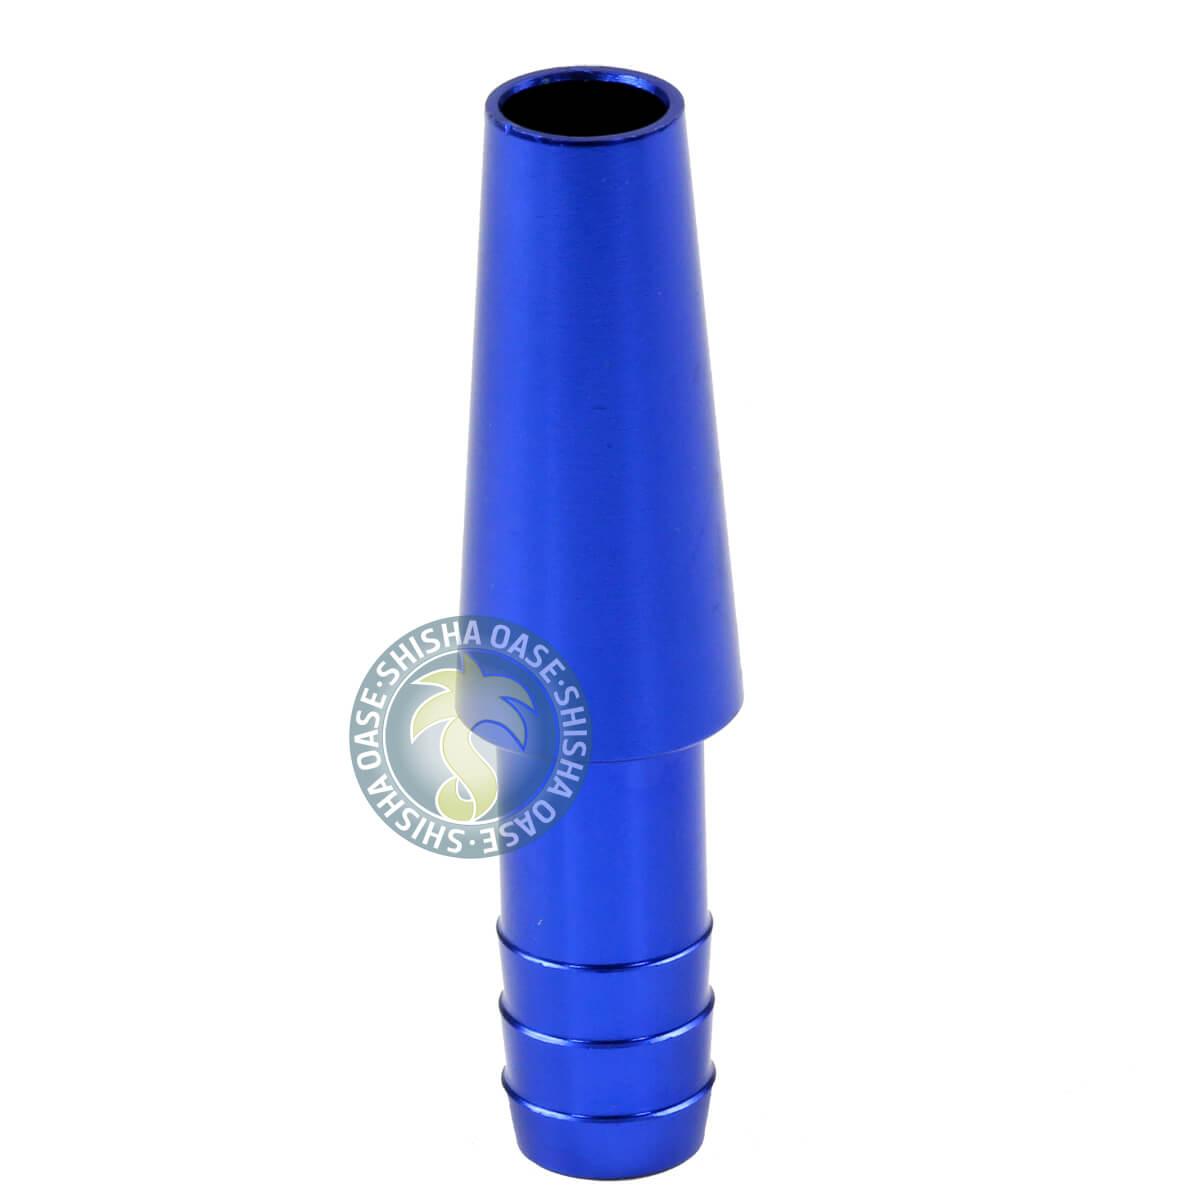 Schlauchanschluss Lang (Rillen - Blau)